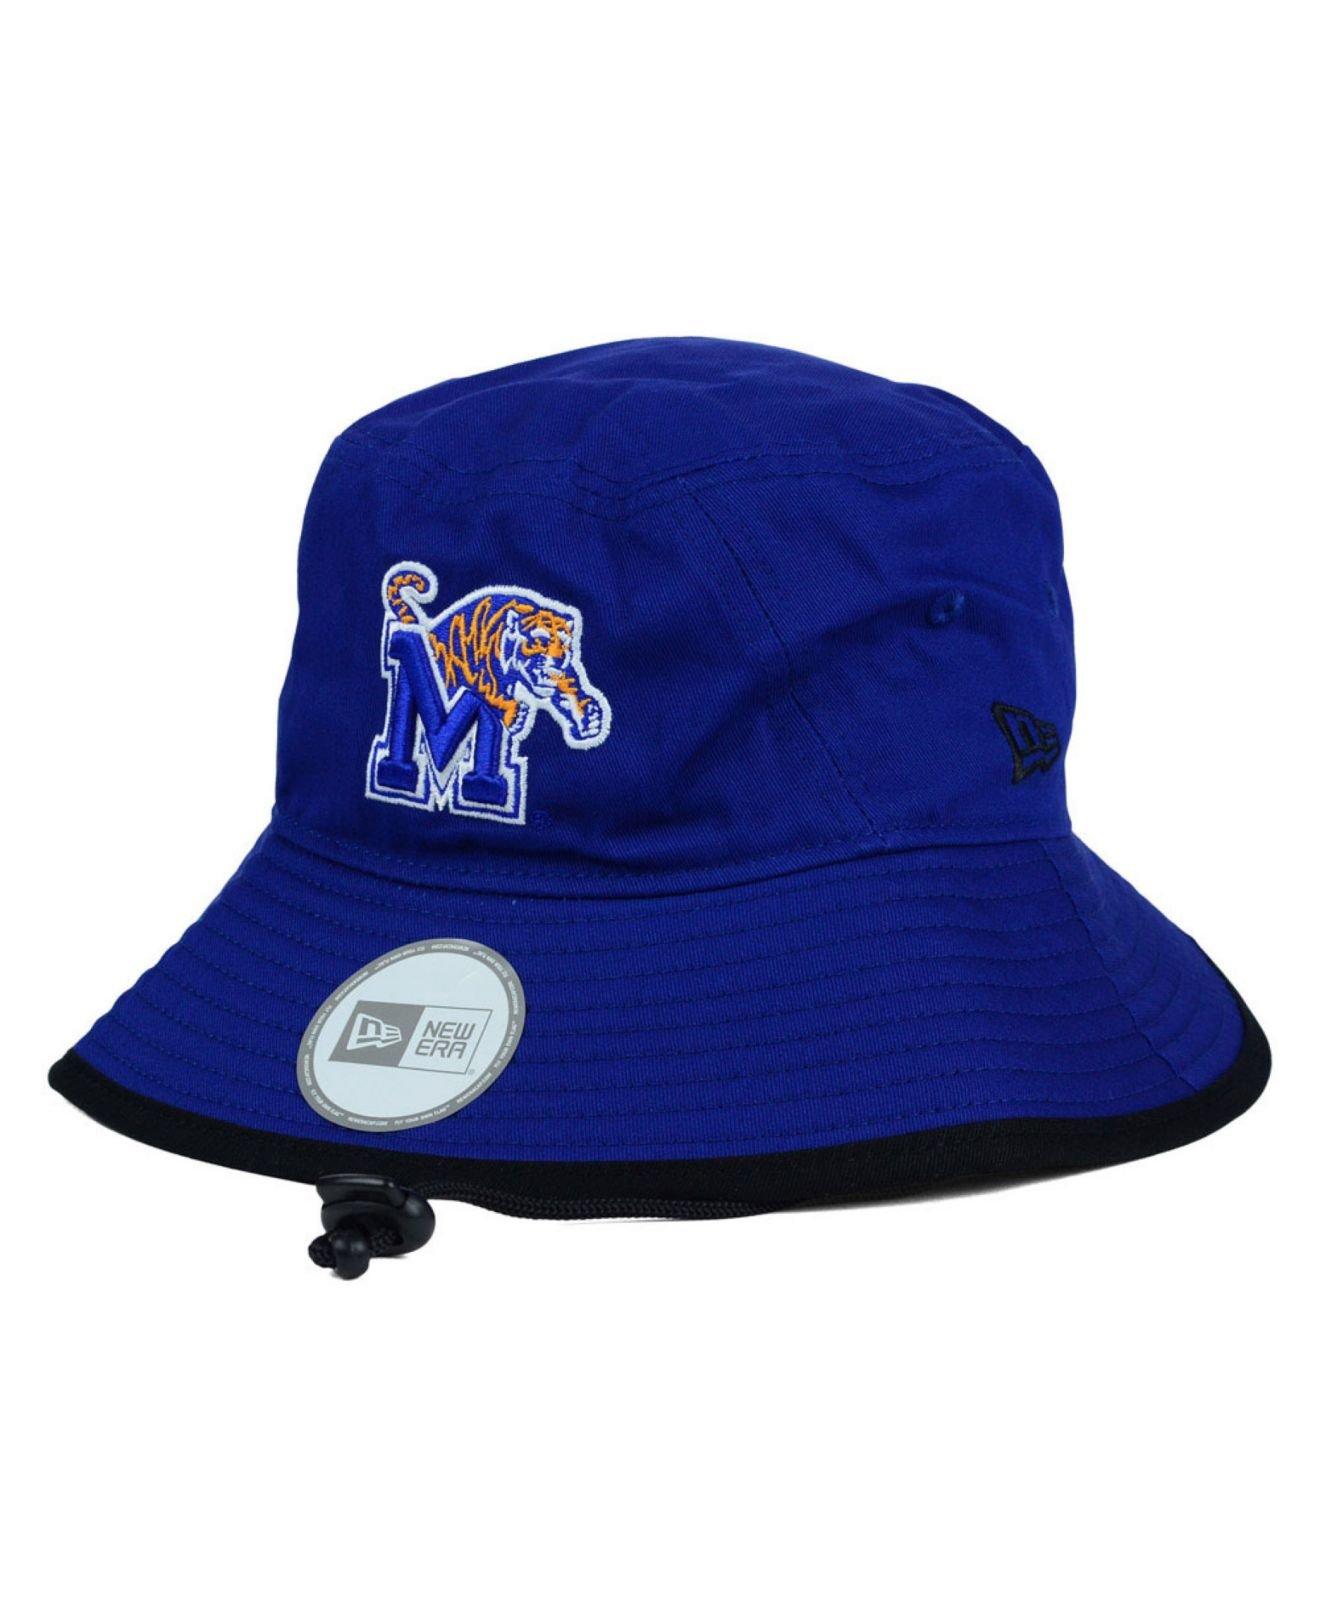 3ab3632c748 ... closeout lyst ktz memphis tigers tip bucket hat in blue for men 3cc62  a946c